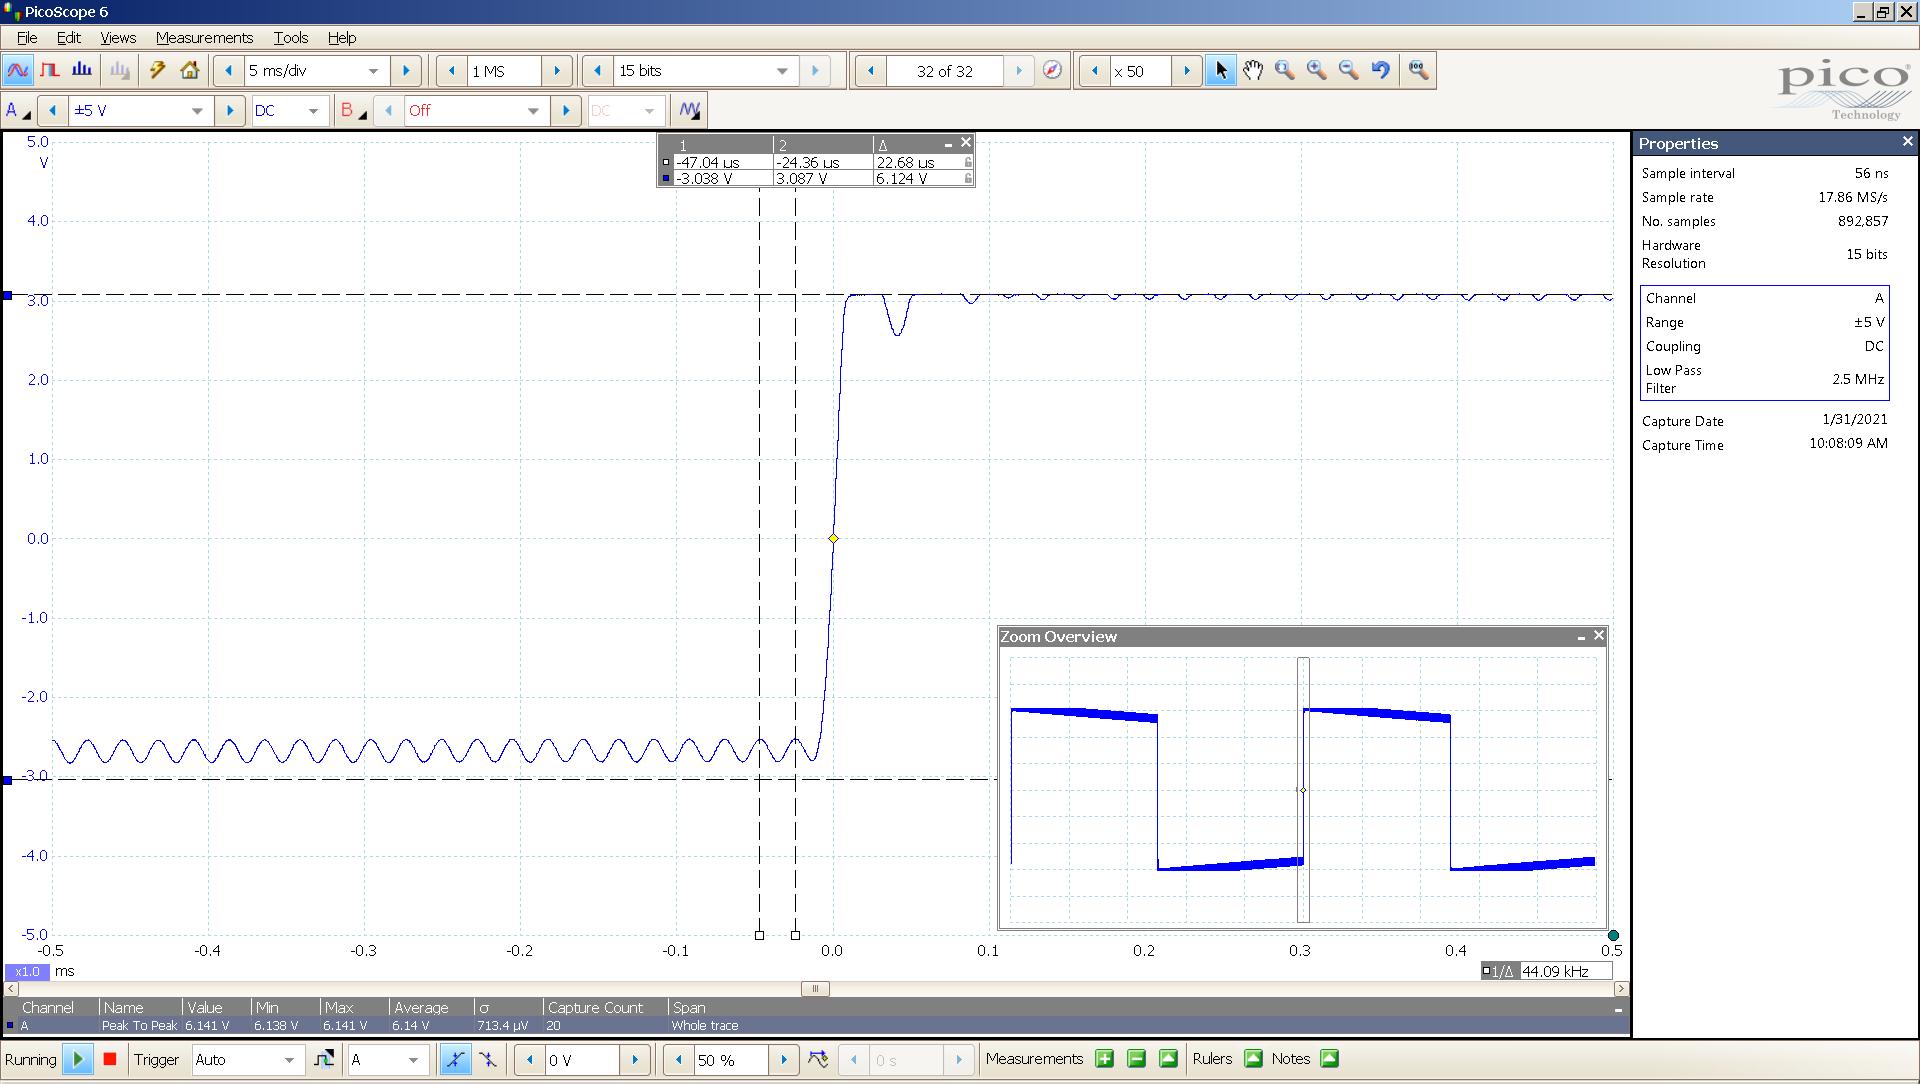 20210131-08 dac2541 40 Hz sqr 5847mVpp 5mS div 5MHz filter AES SE Slow 0 dBFS t3.png